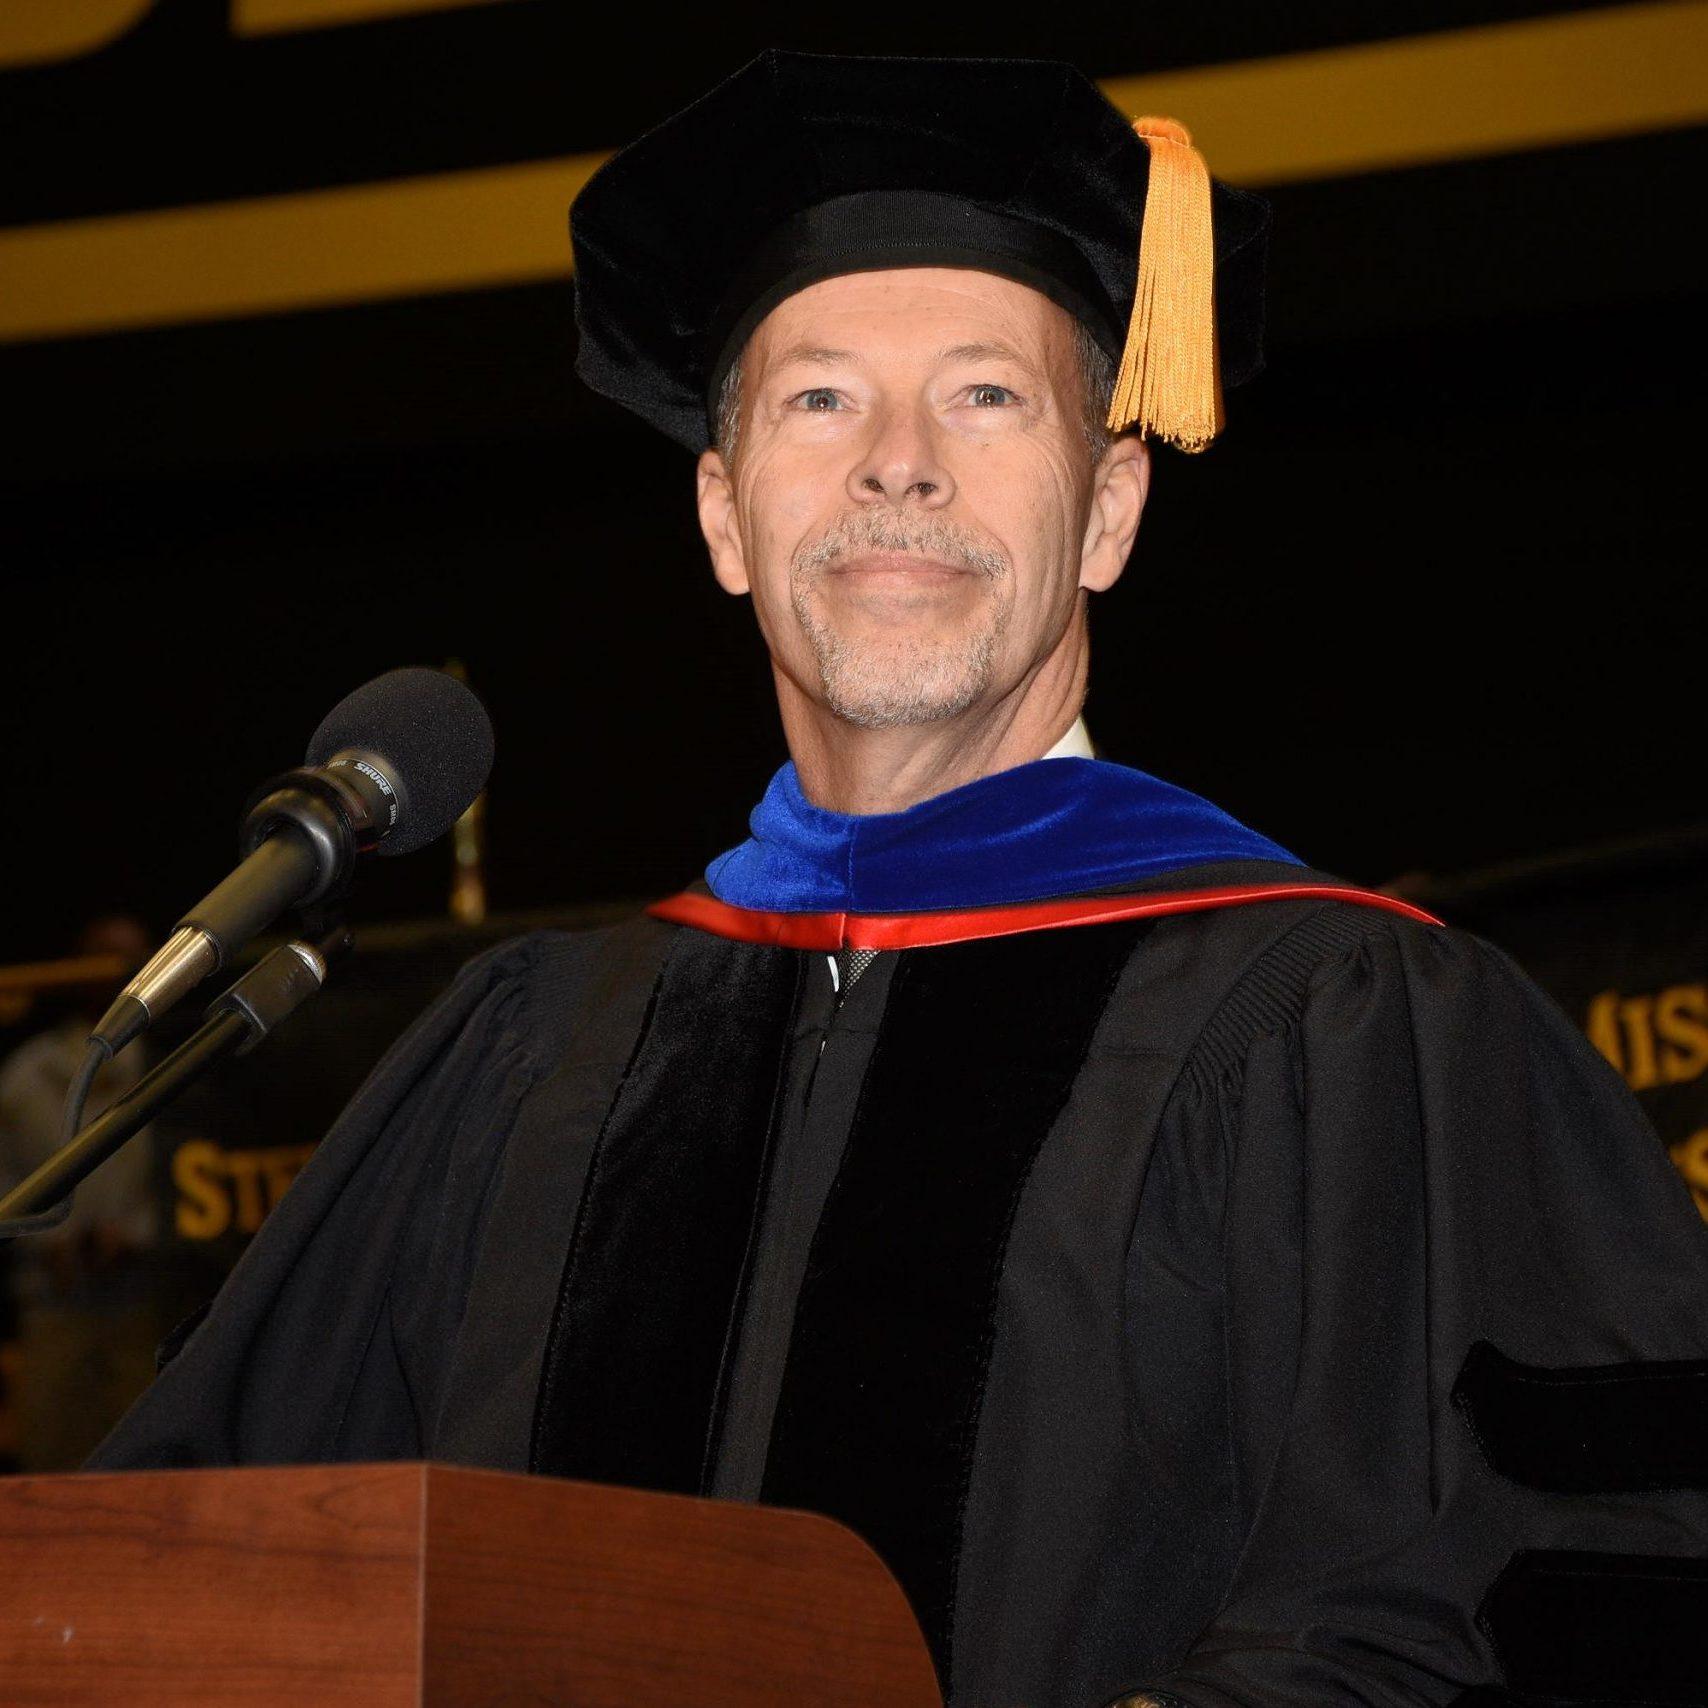 Dr. Doug Davenport standing a podium